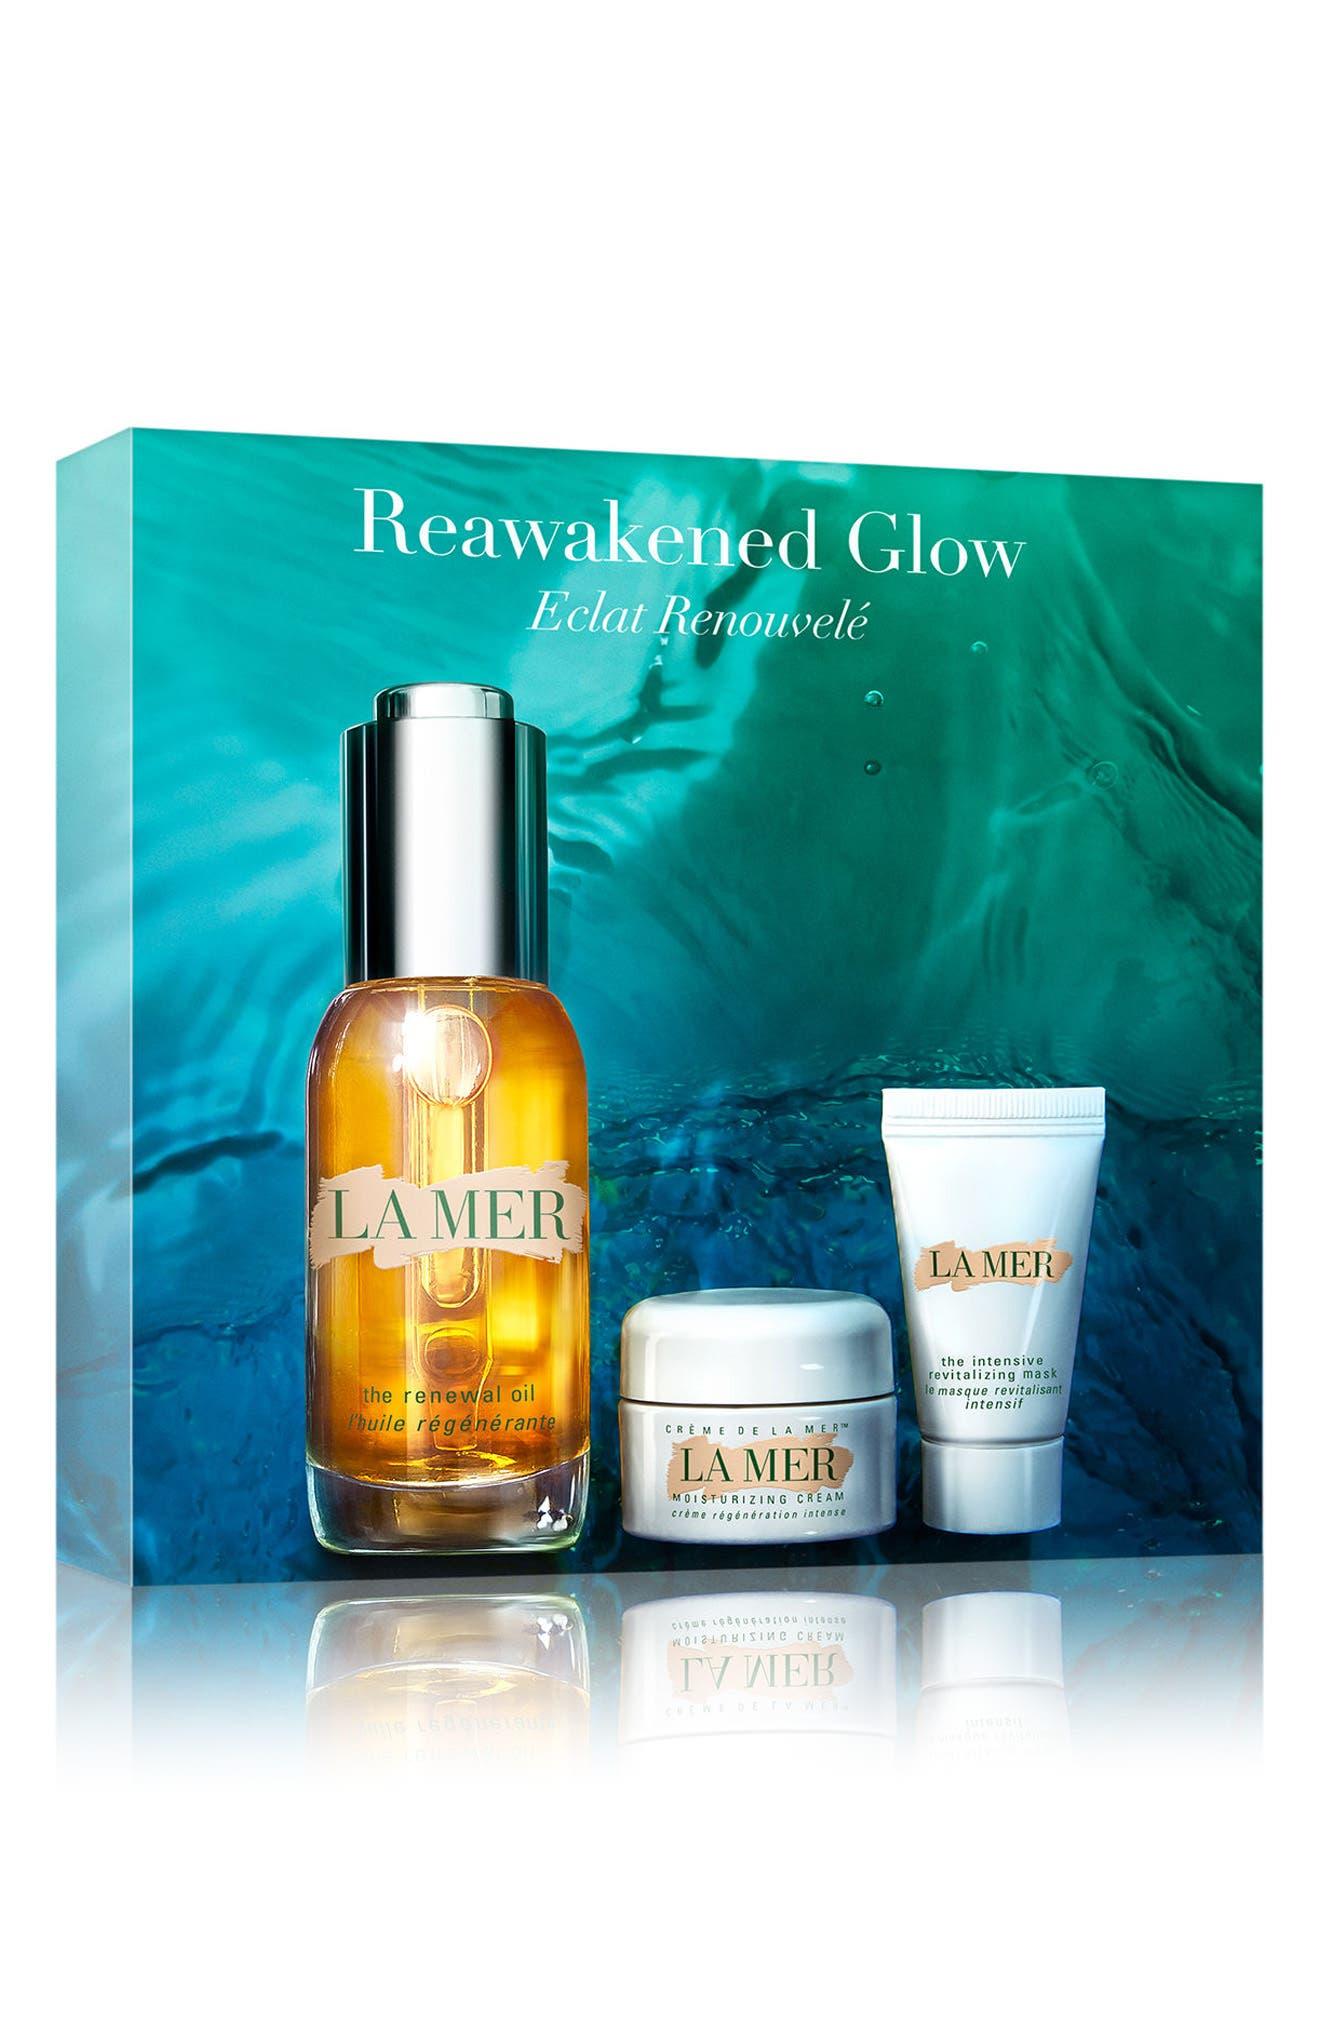 La Mer Reawakened Glow Collection ($285 Value)